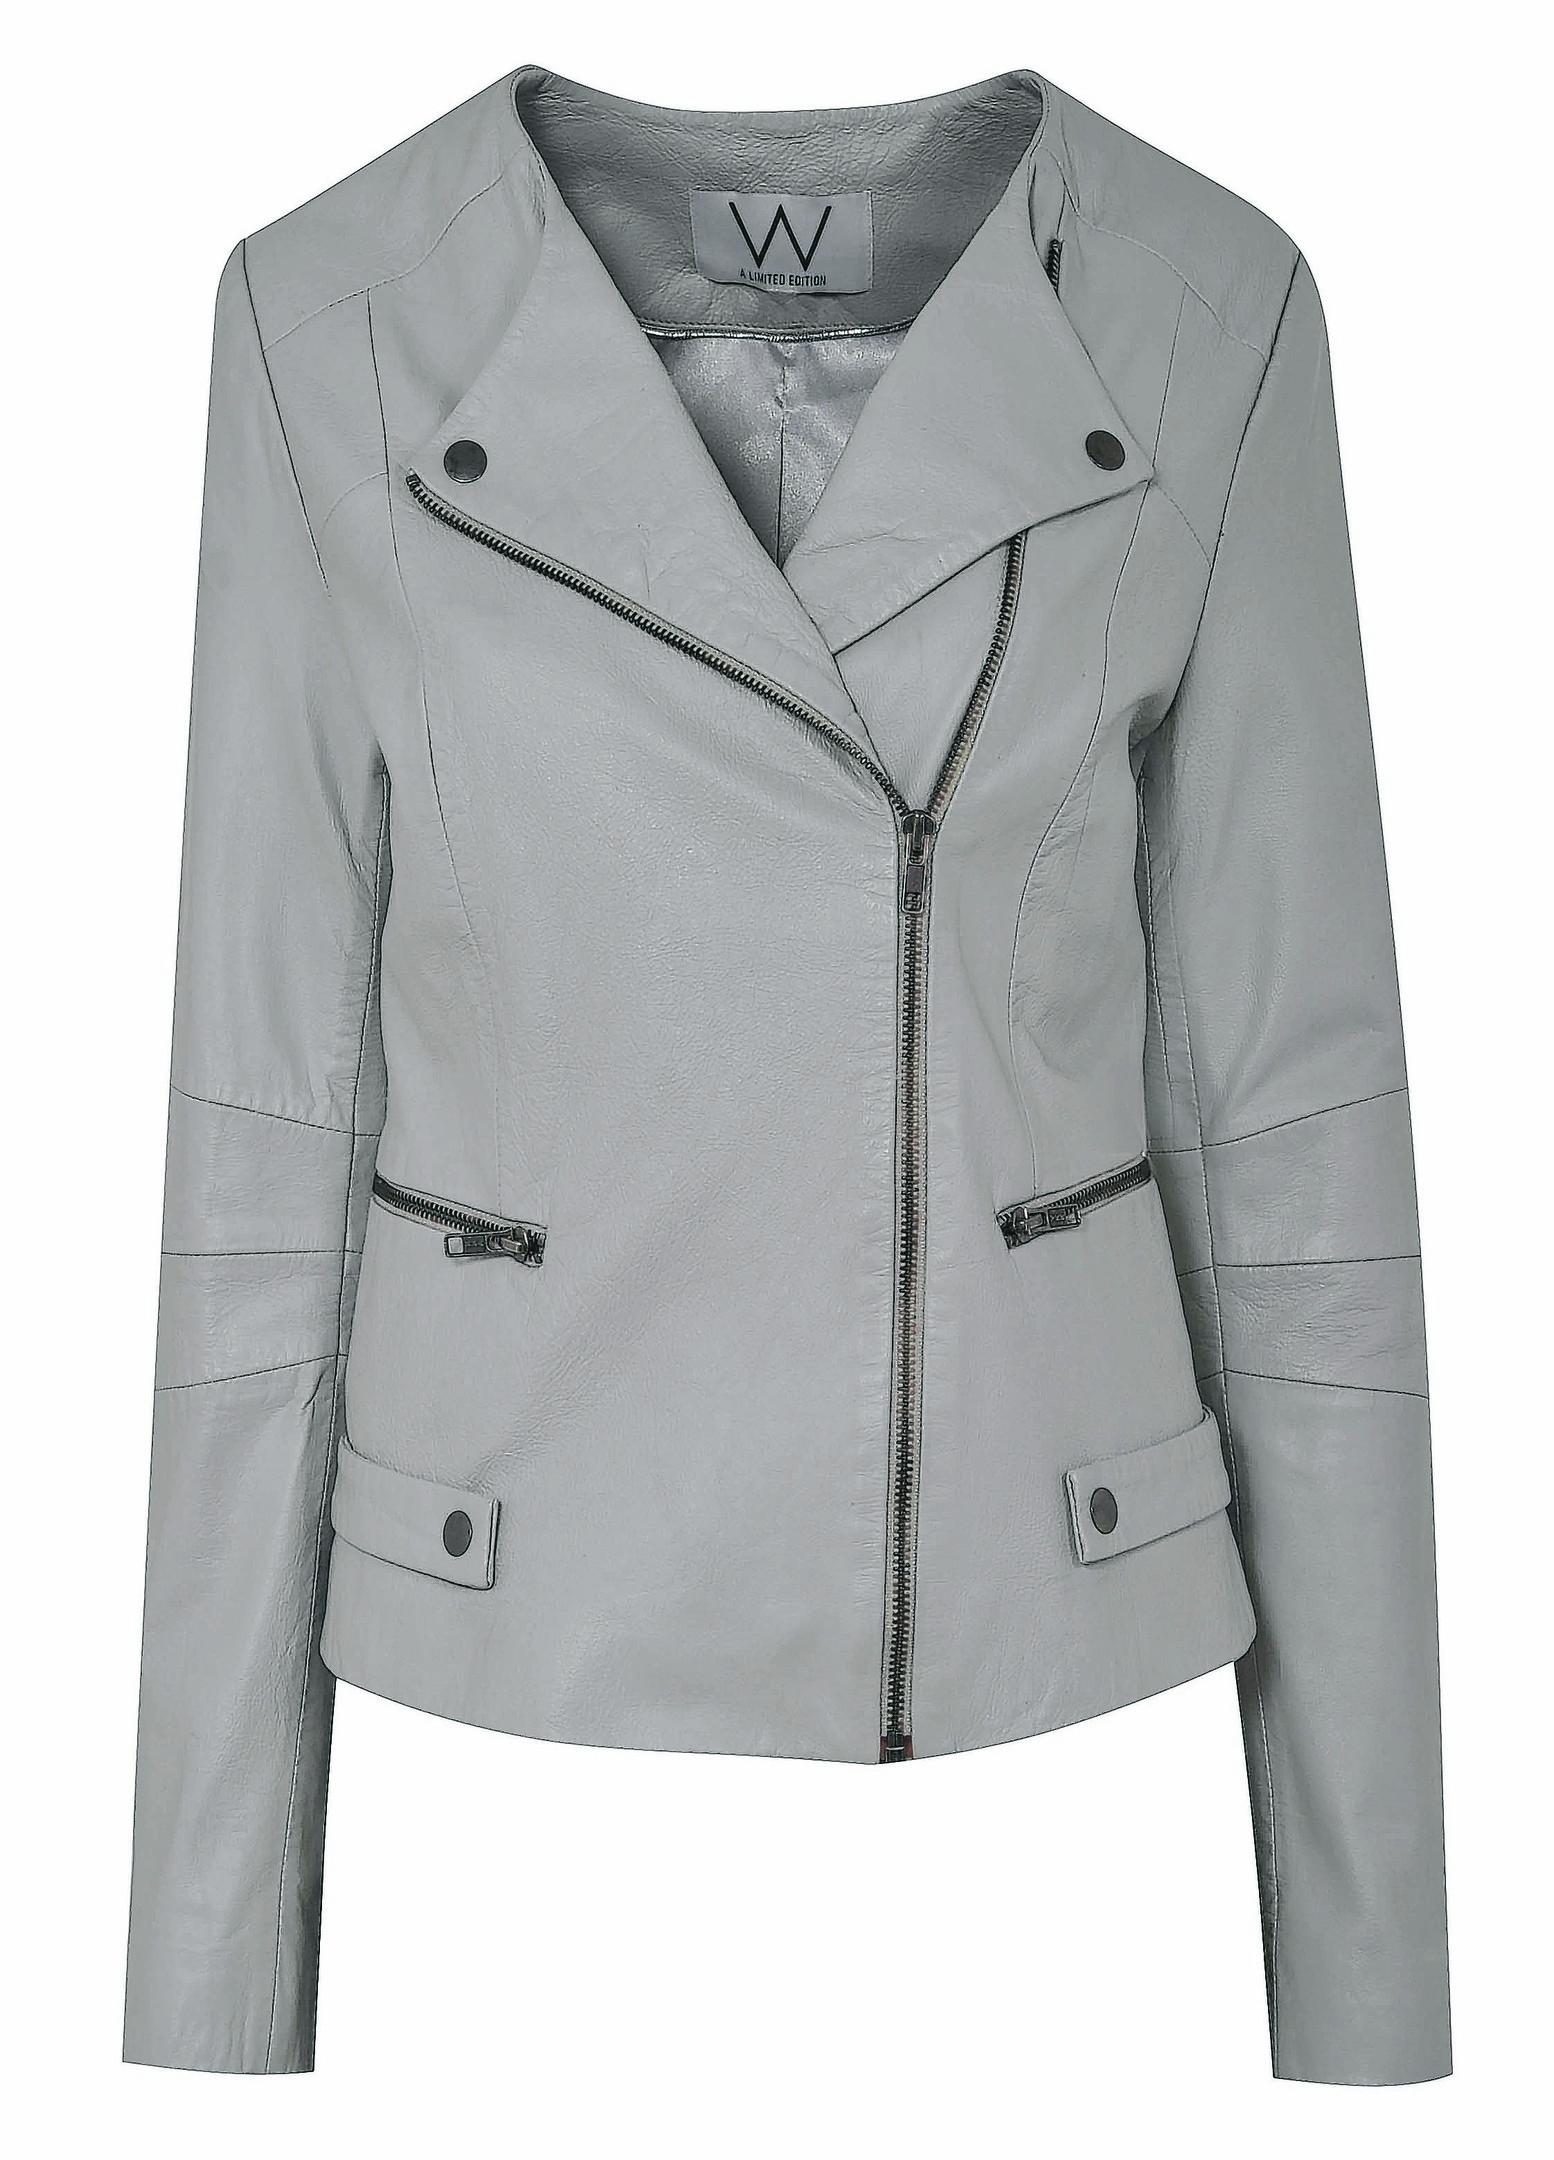 Wallis Grey Collarless Leather Jacket.